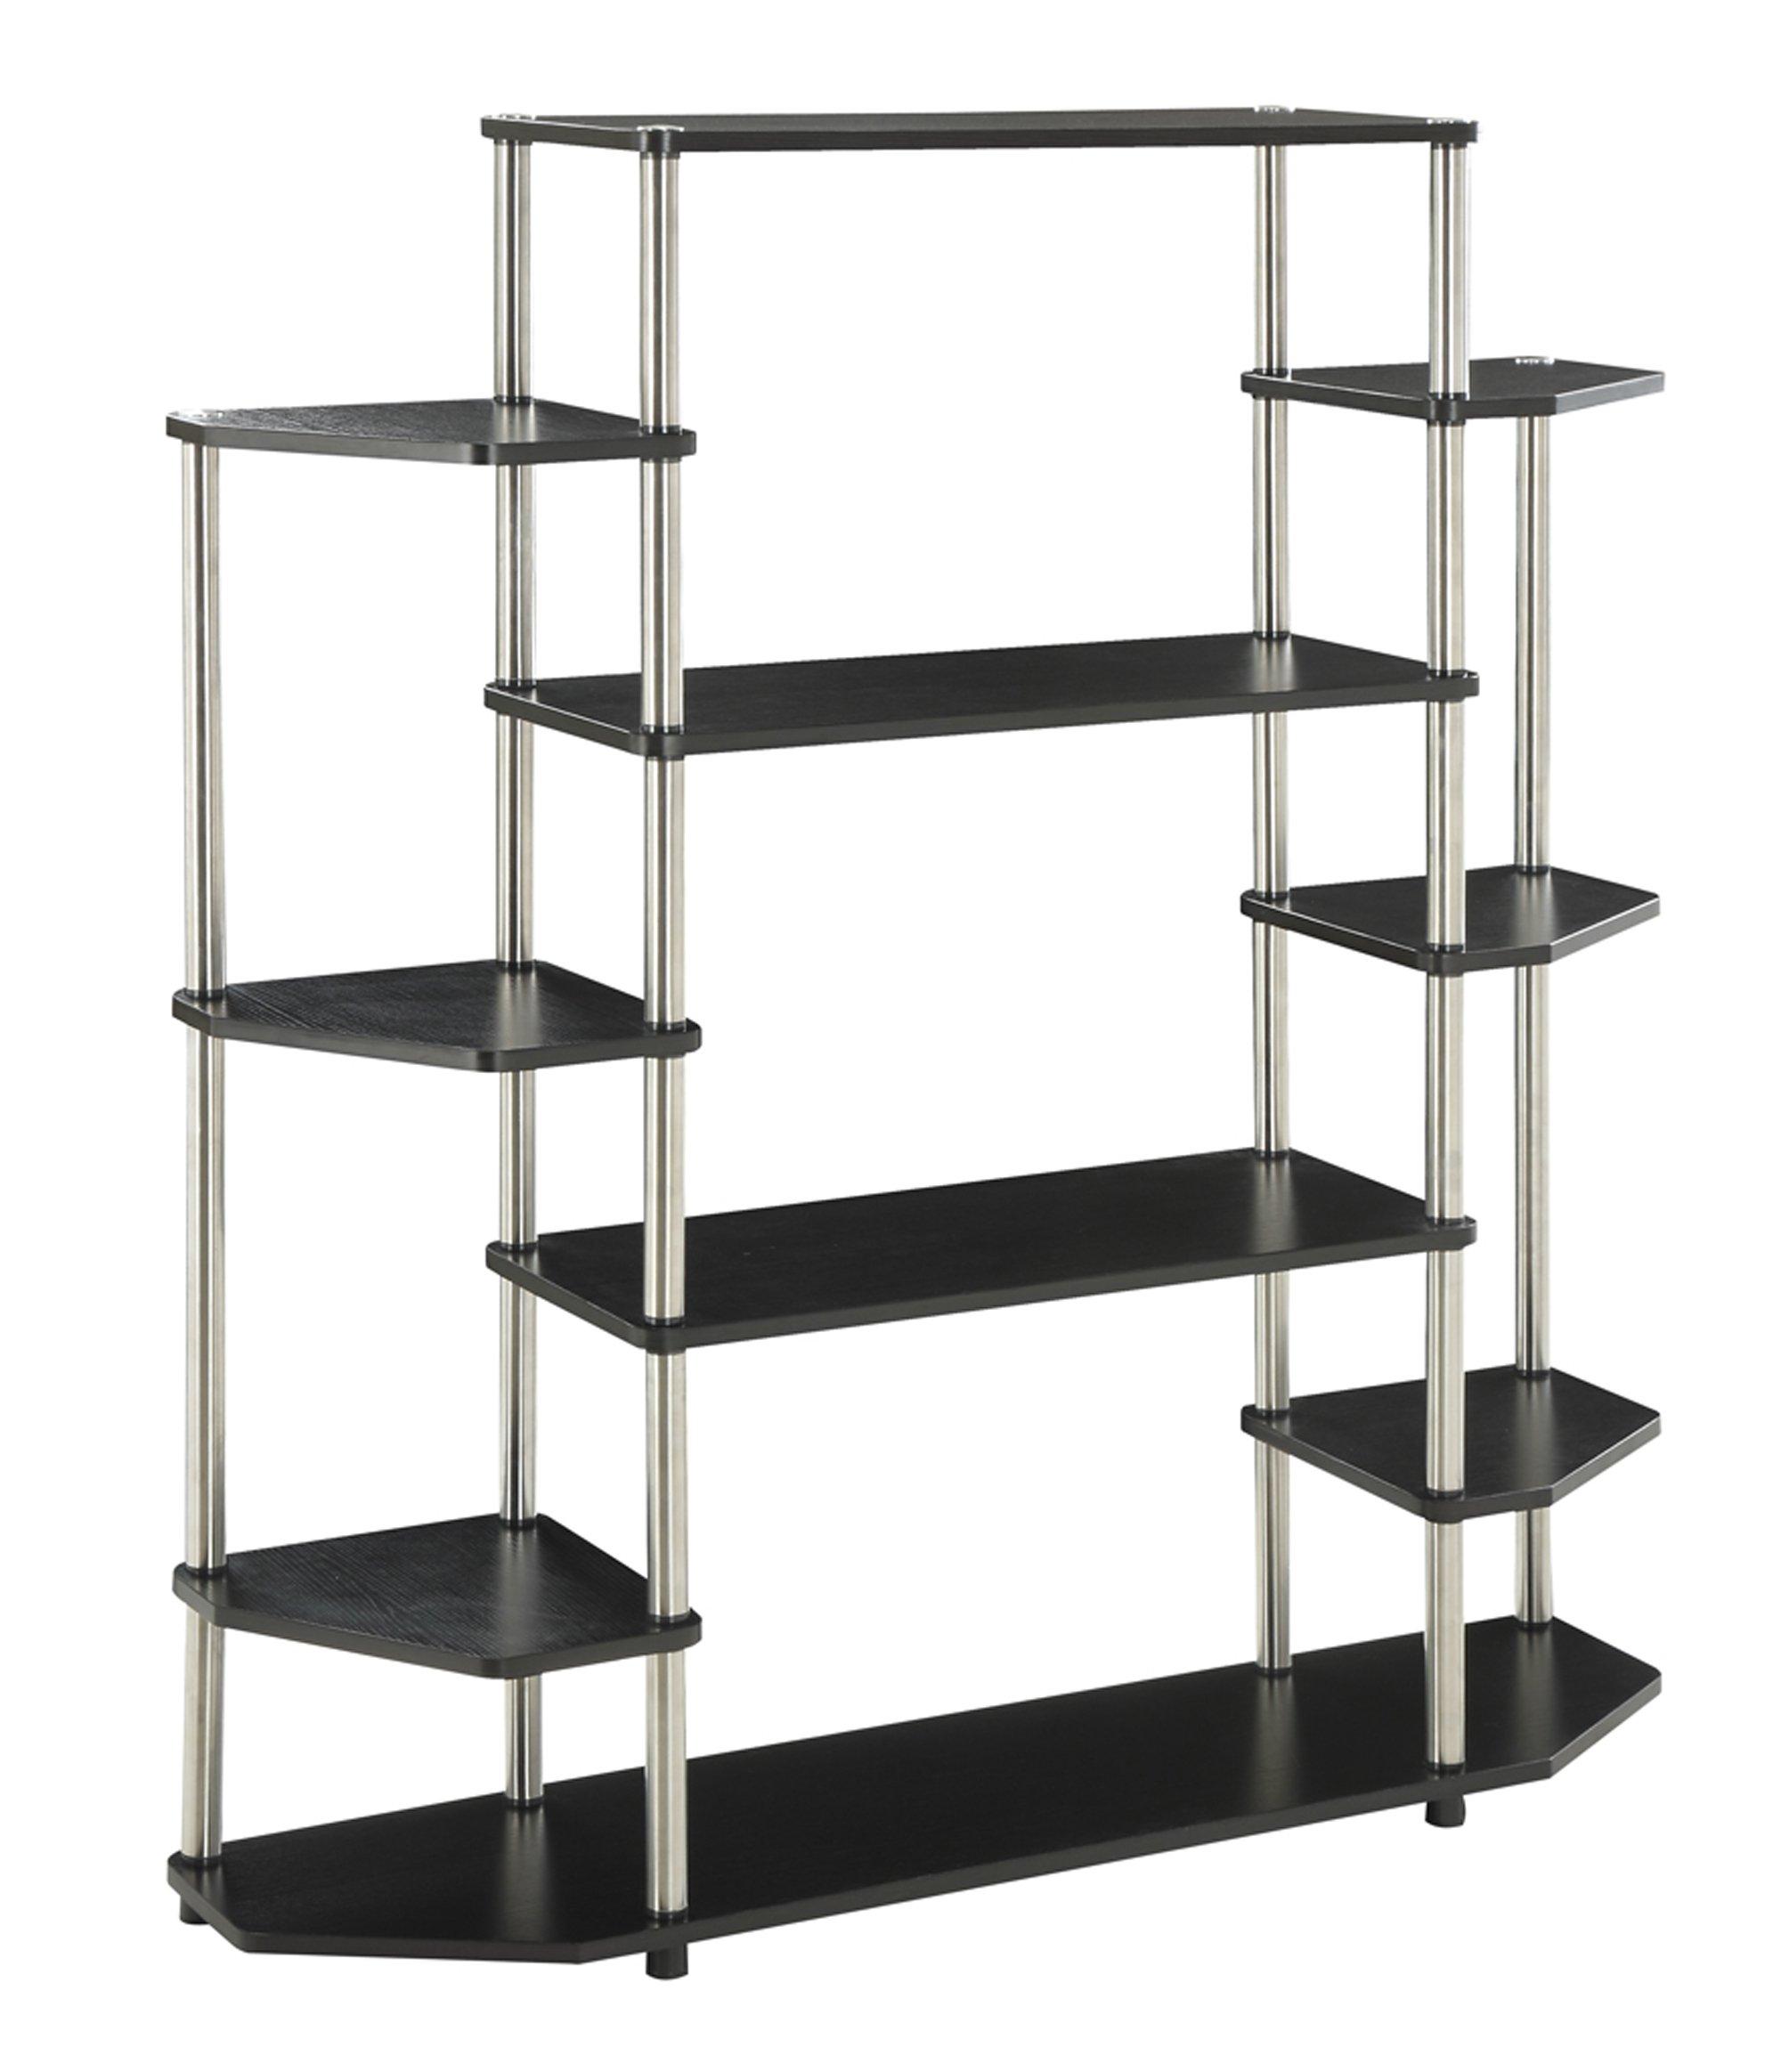 Convenience Concepts Designs2Go Wall Unit Bookshelf, Black